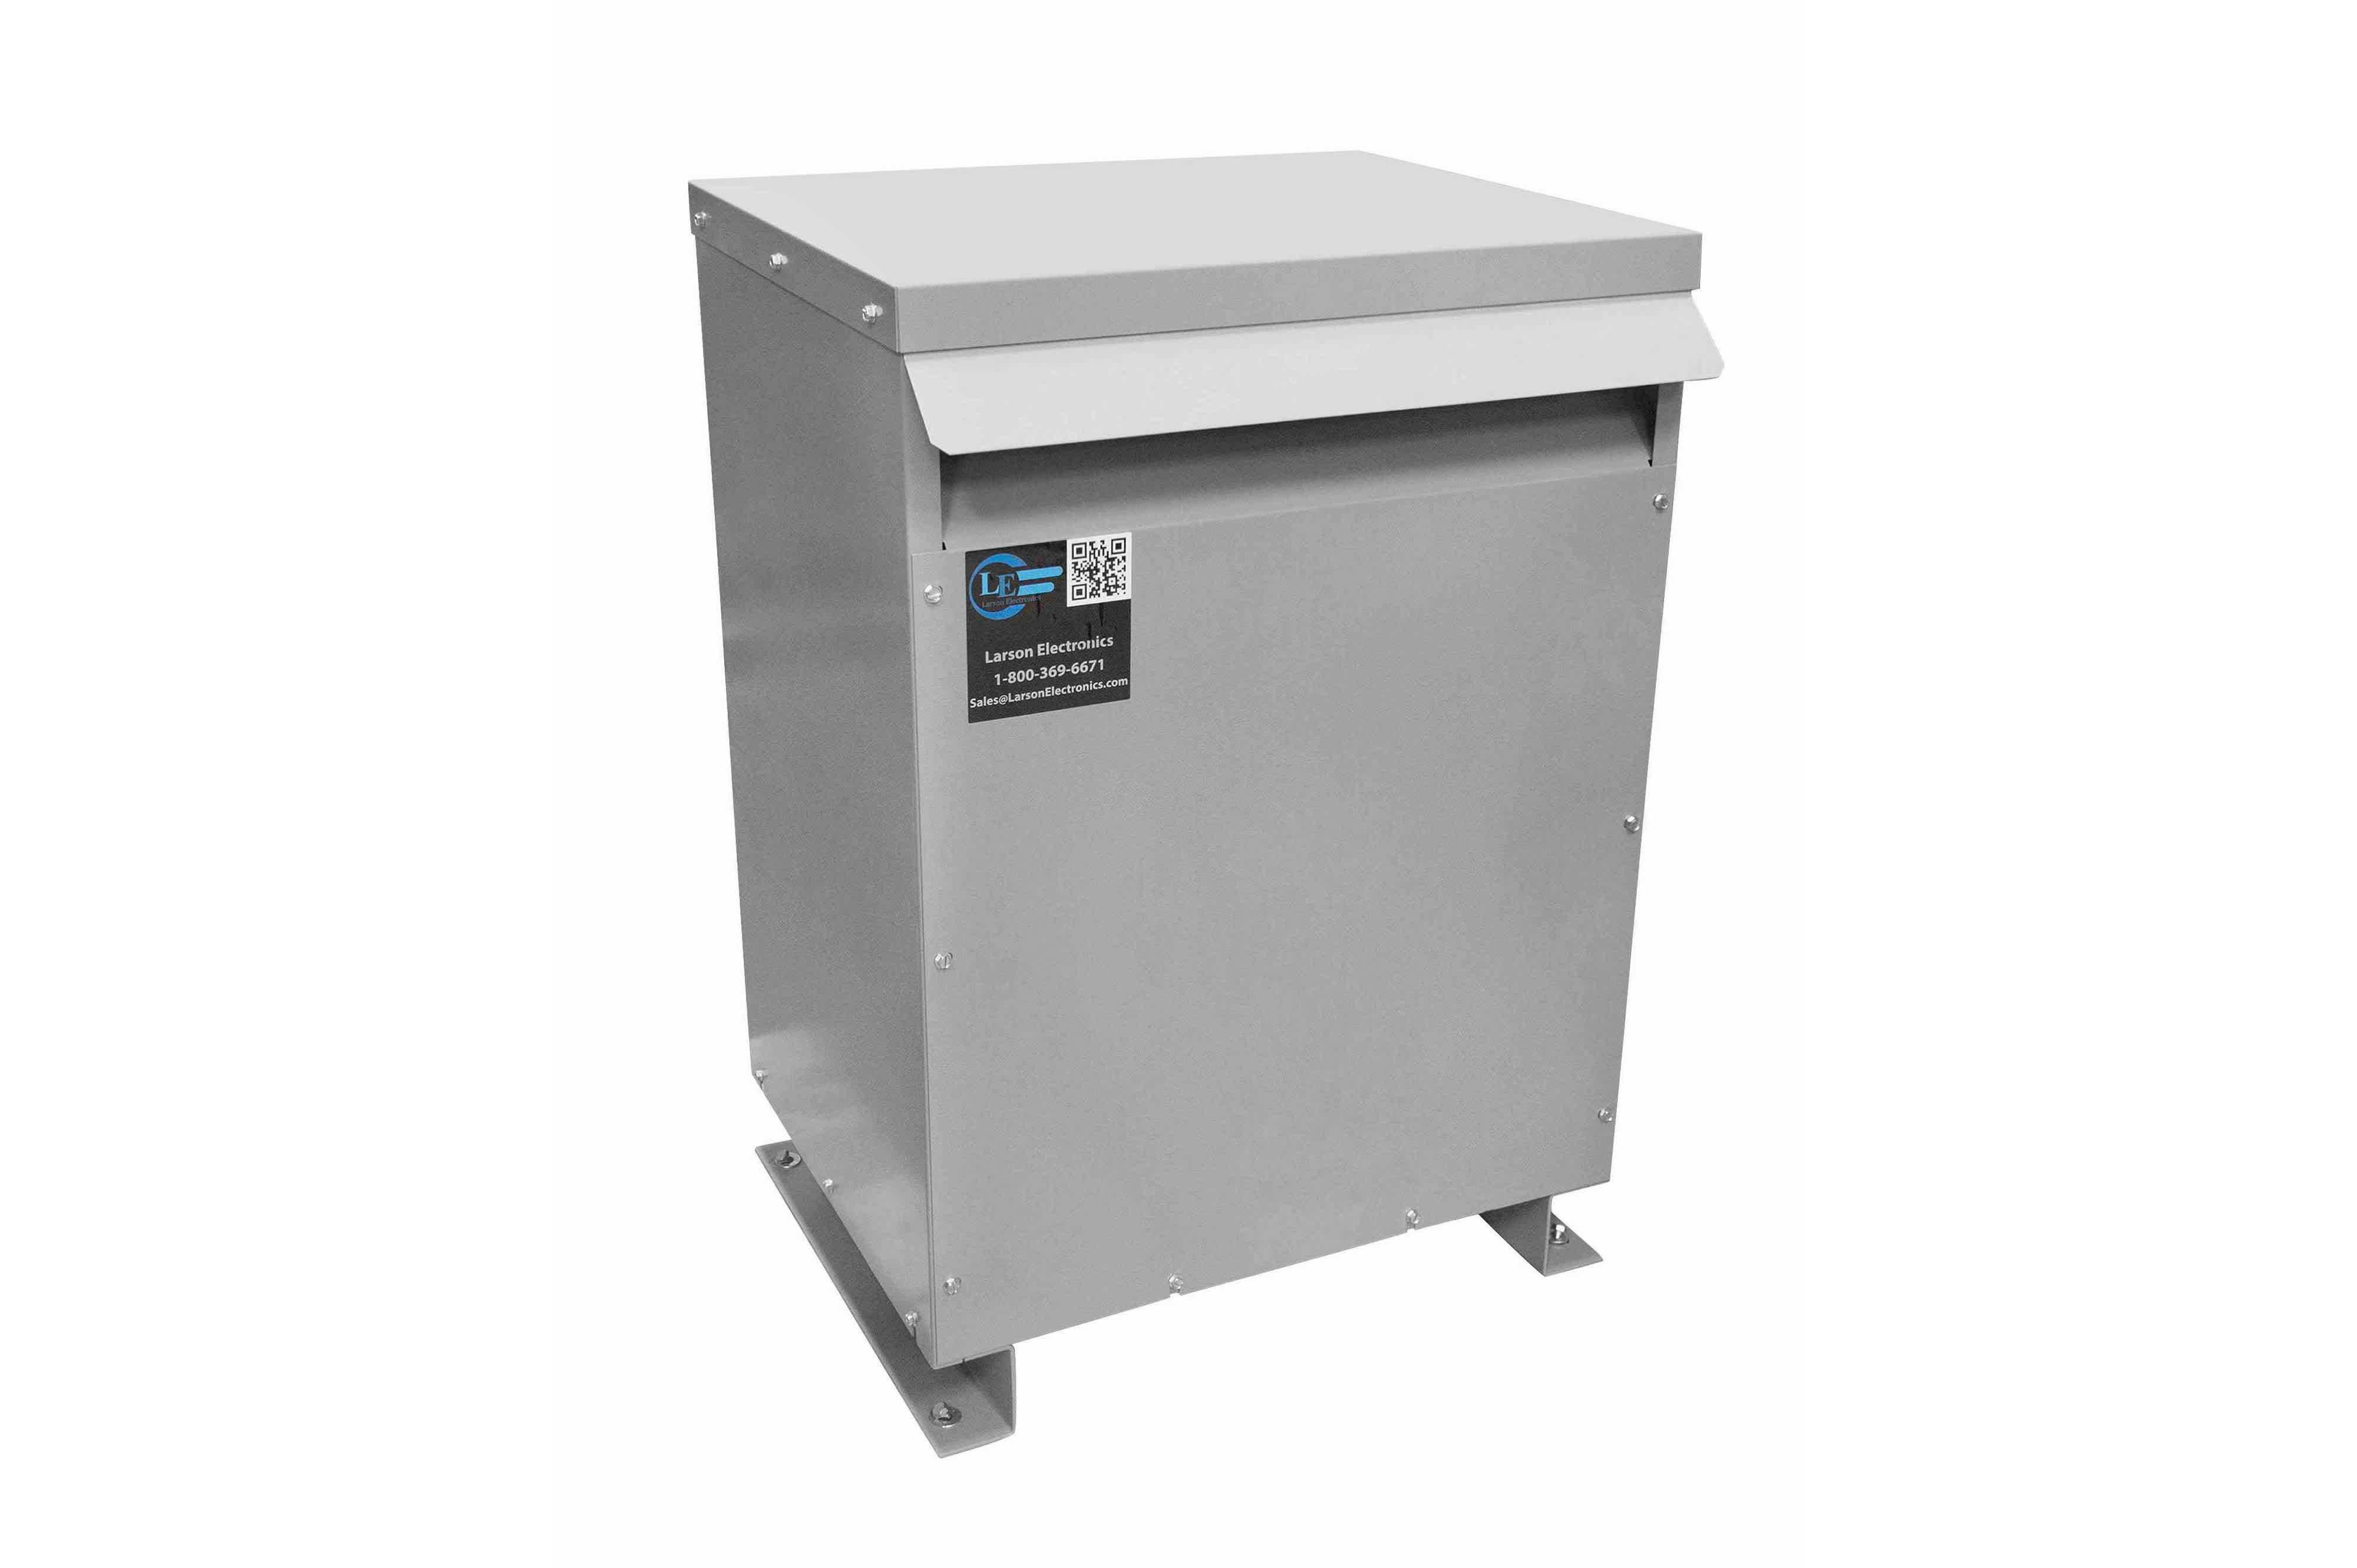 45 kVA 3PH Isolation Transformer, 240V Wye Primary, 480V Delta Secondary, N3R, Ventilated, 60 Hz